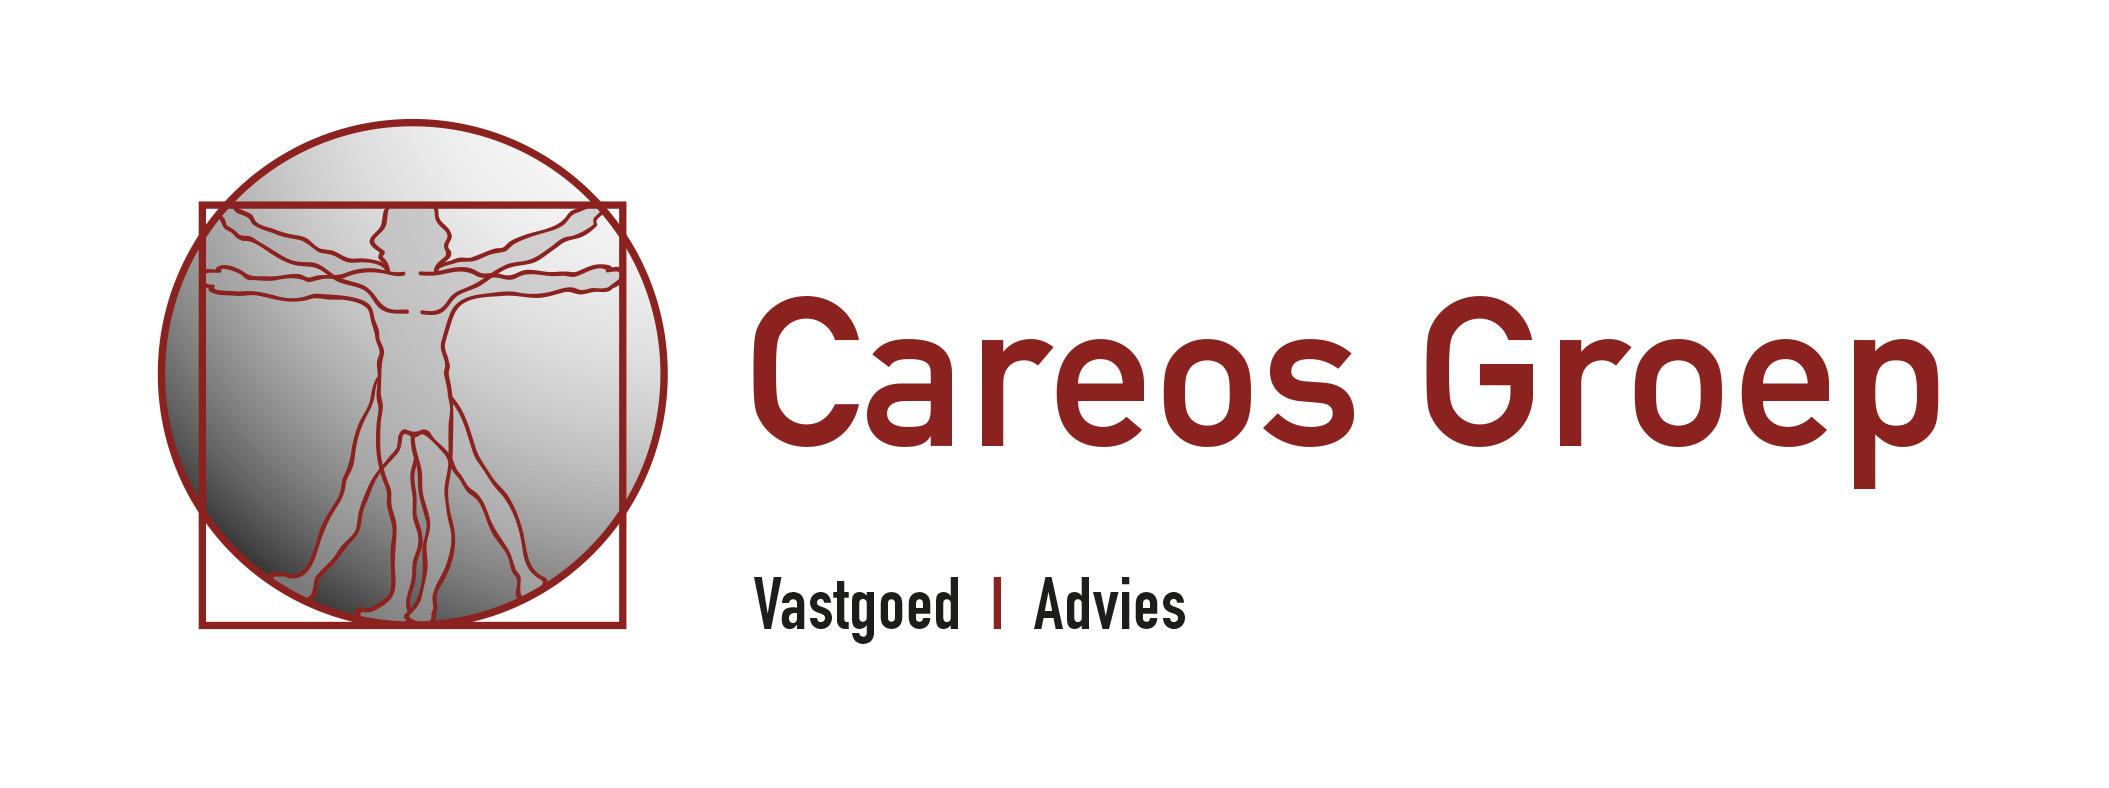 Careos Groep